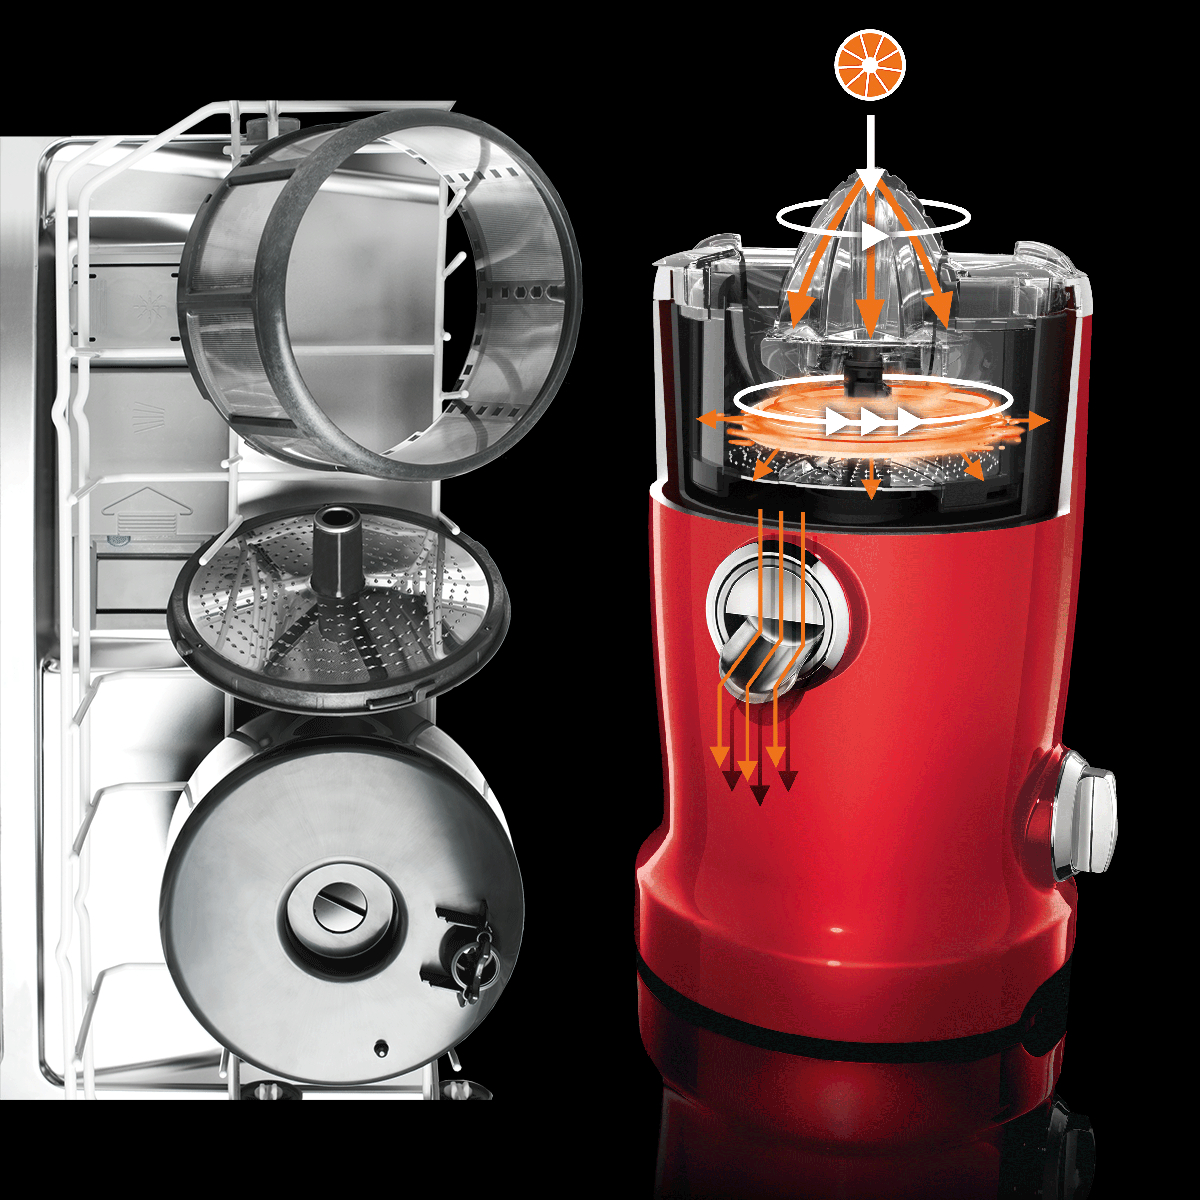 Novis Vita Juicer Cherry Red 4-in-1 Multi-Function Electric Juicer